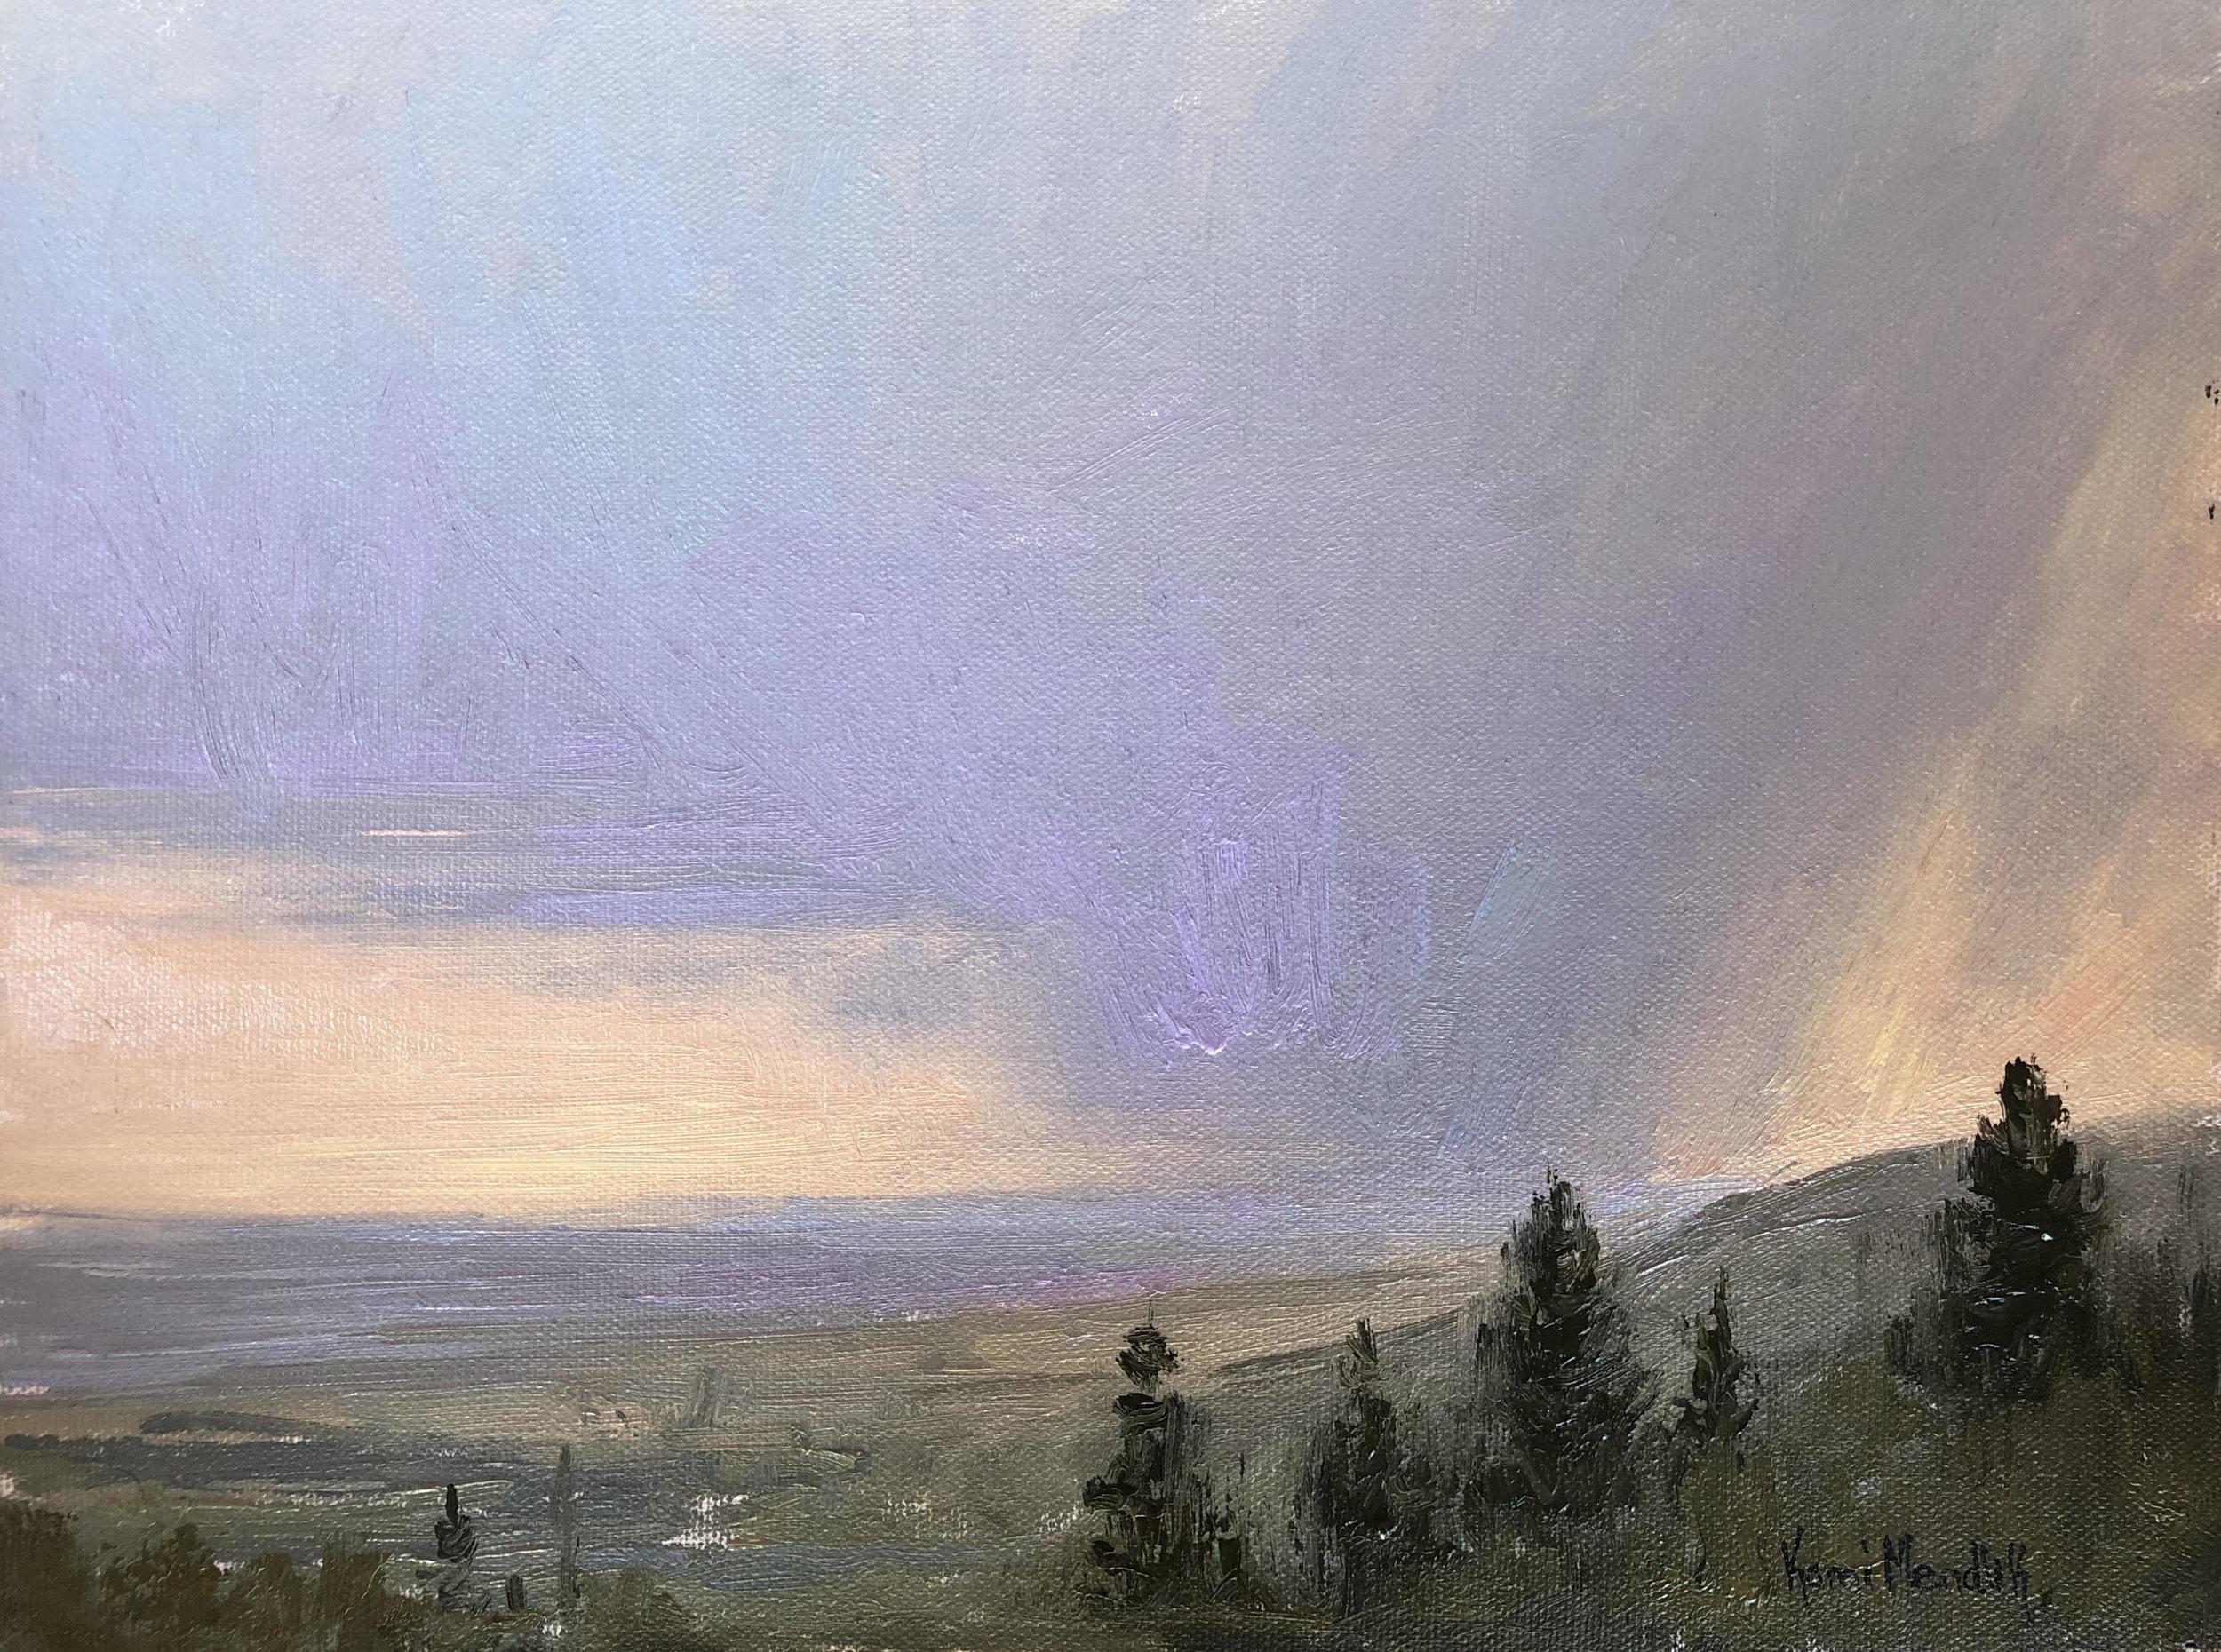 Landscape painting by Kami Mendlik